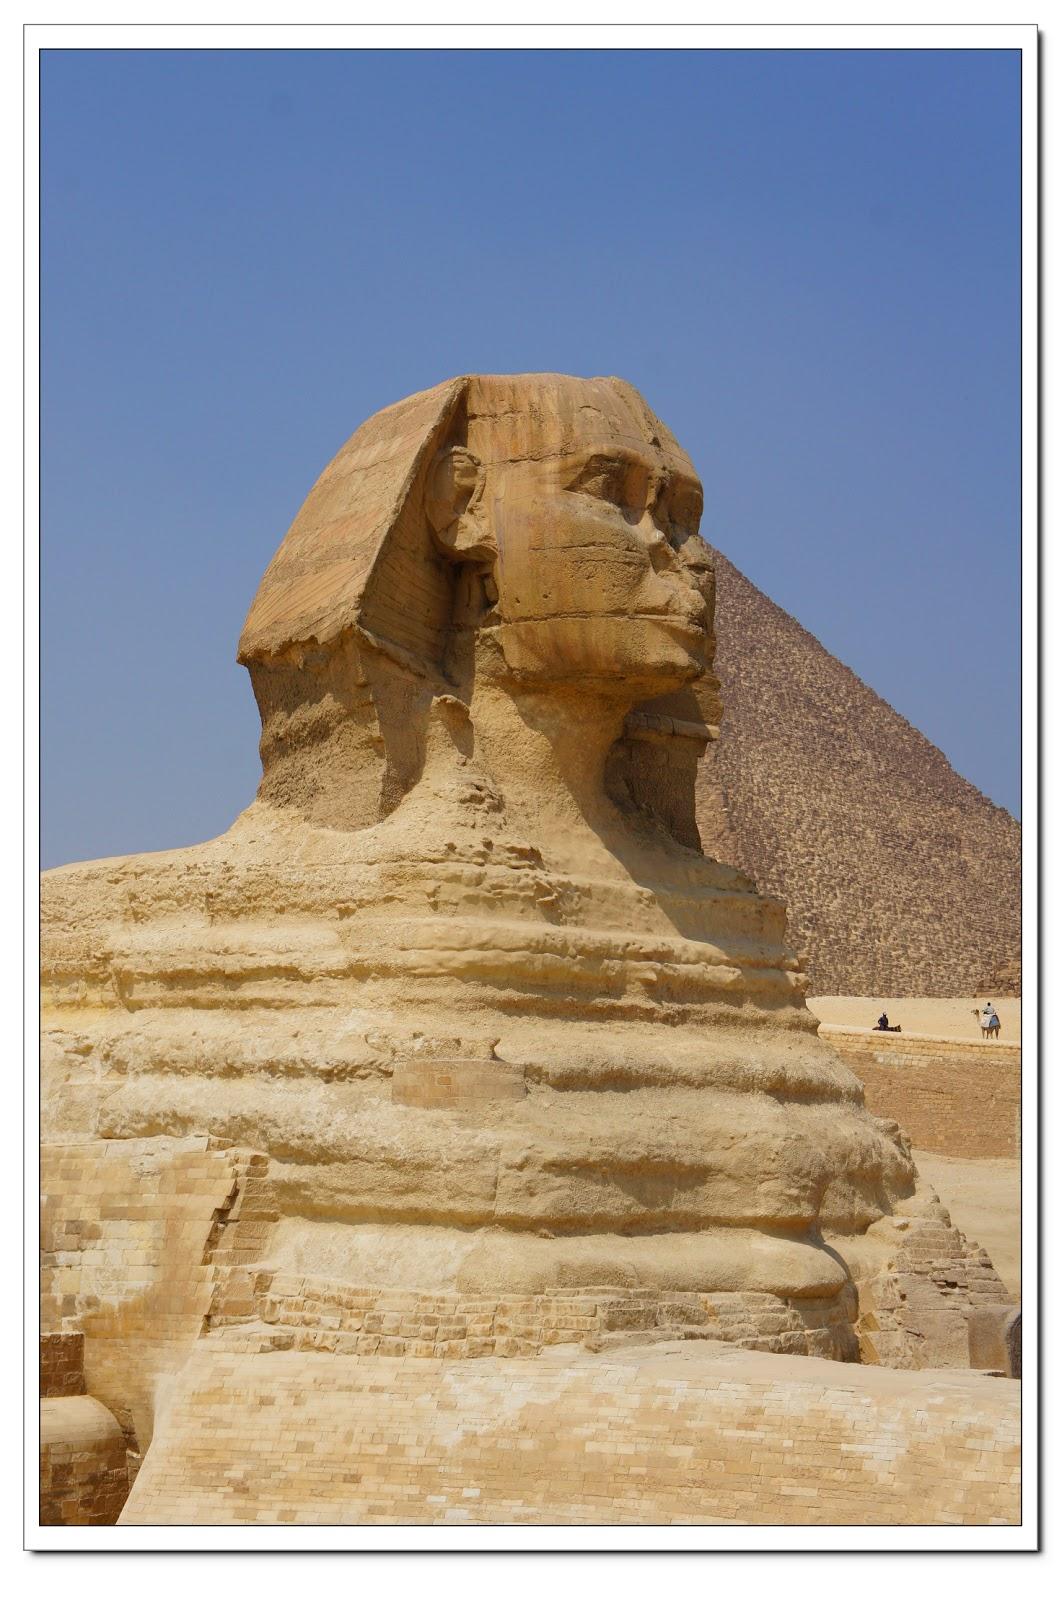 凱西在路上。Cathy on the way。: 埃及 - Day 2(上) - 吉薩金字塔區